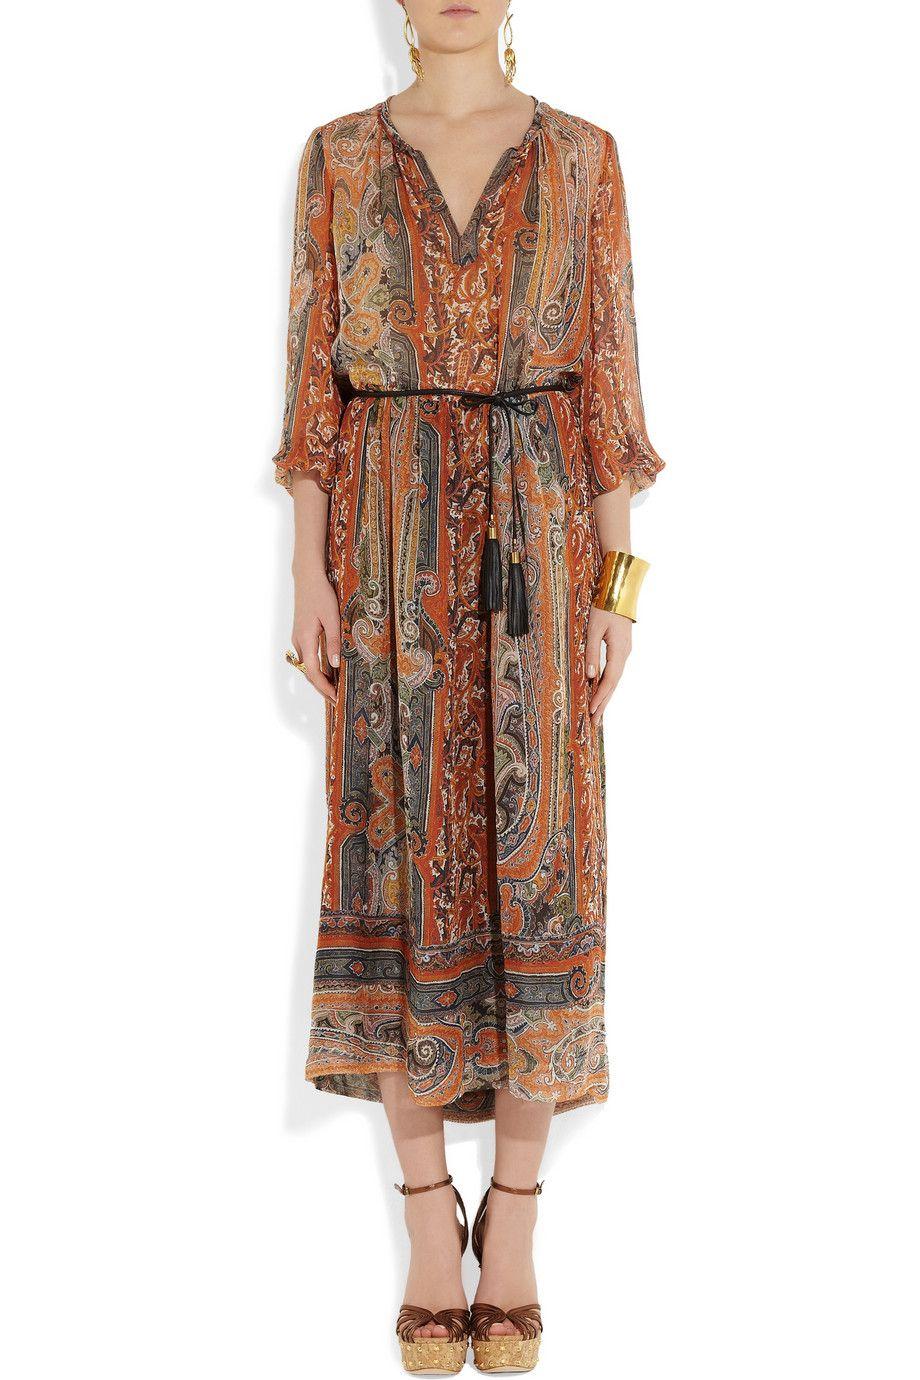 Isabel Marant Samuel Printed Silk Gauze Midi Dress Dresses Silk Printing Isabel Marant [ 1380 x 920 Pixel ]